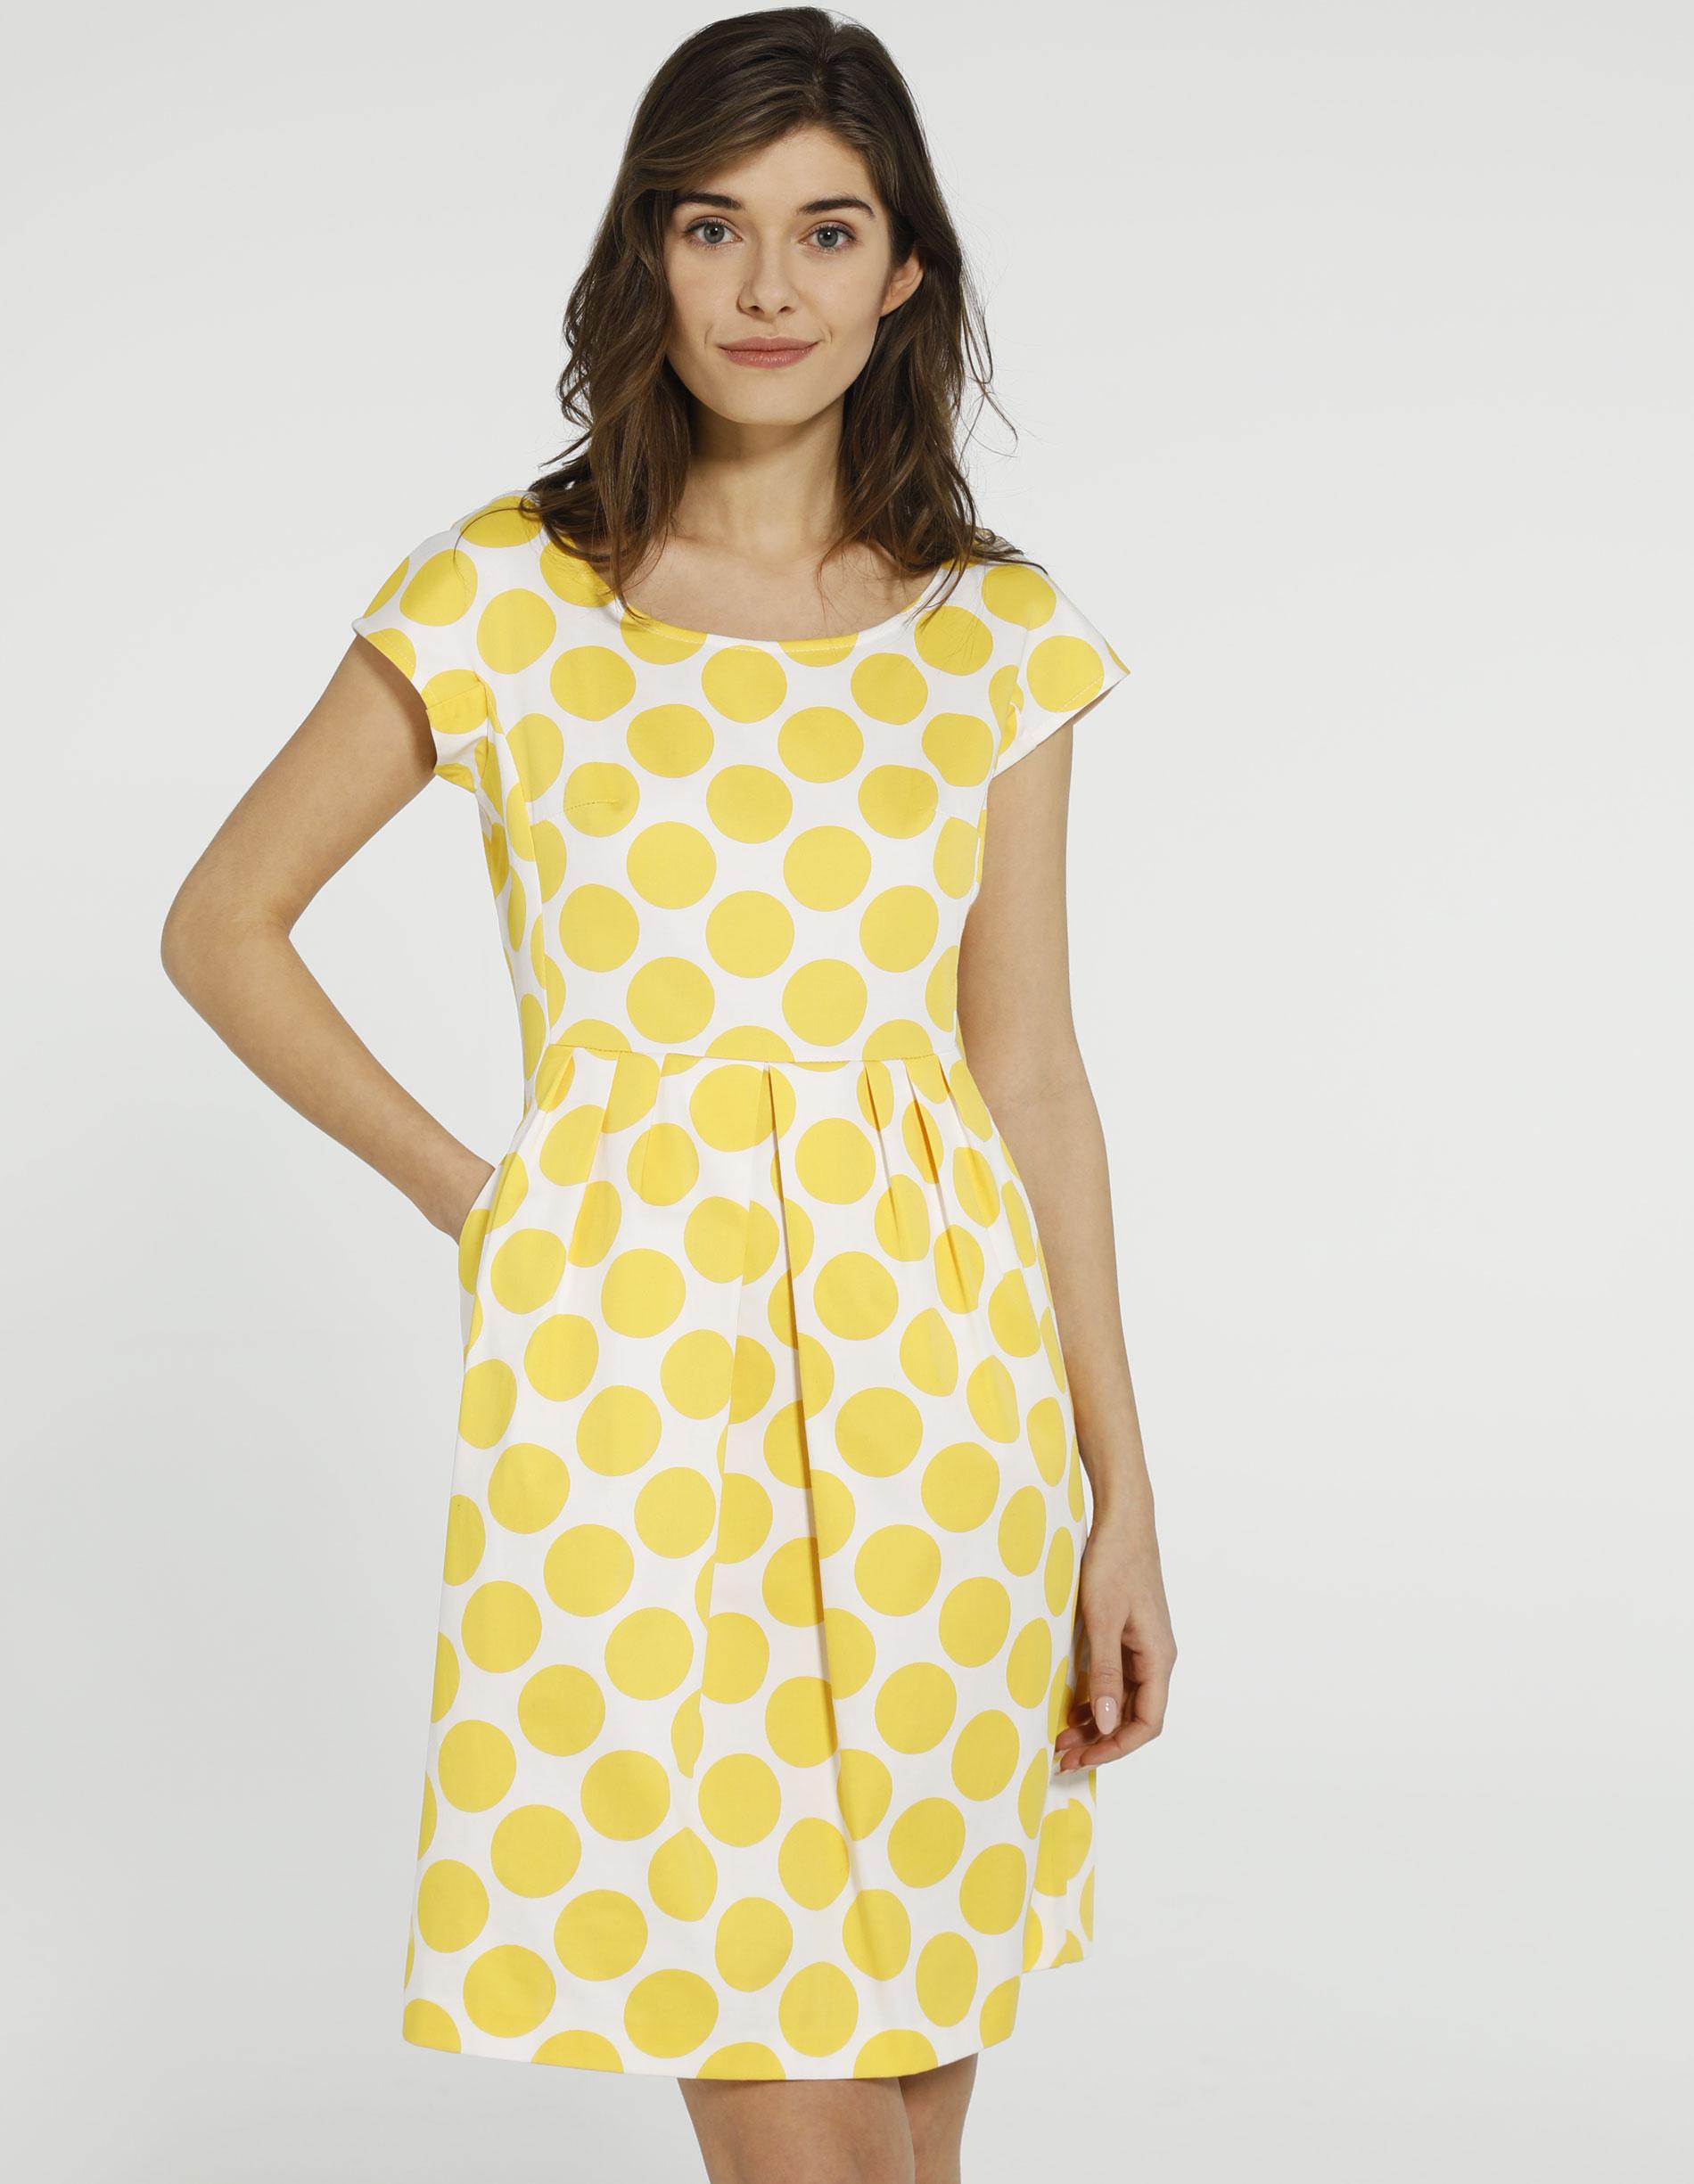 Sukienka - Q51A129 BI-GI - Unisono